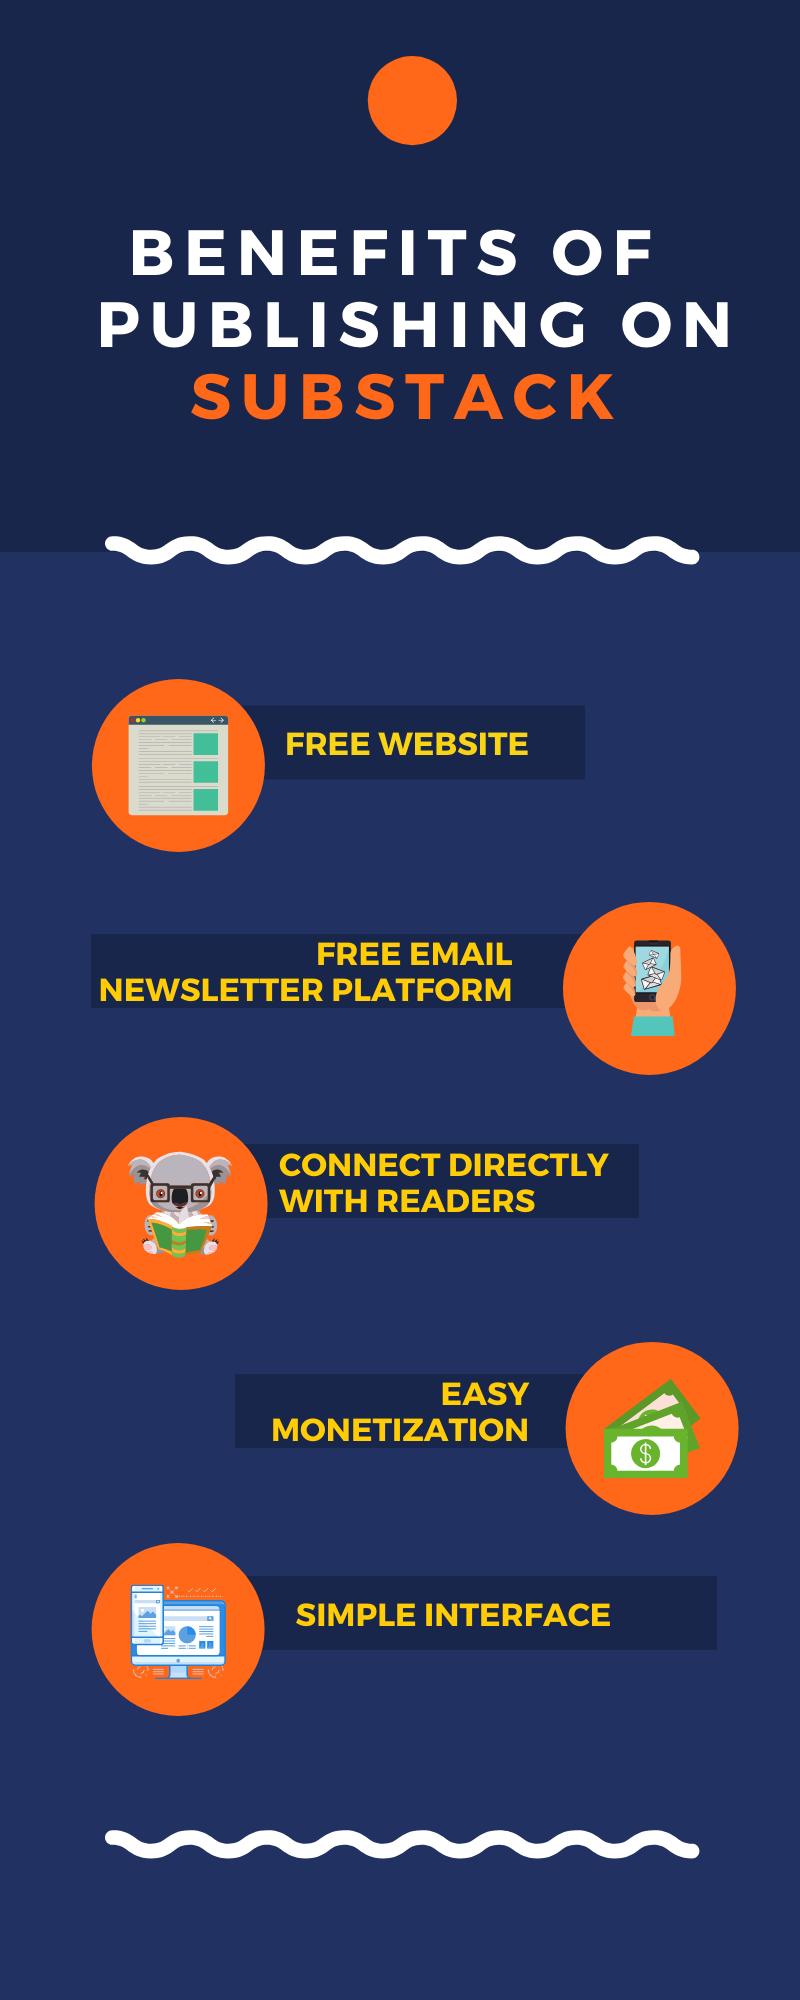 substack newsletters, substack pricing, best substack newsletters, substack vs mailchimp, what is substack, substack wiki